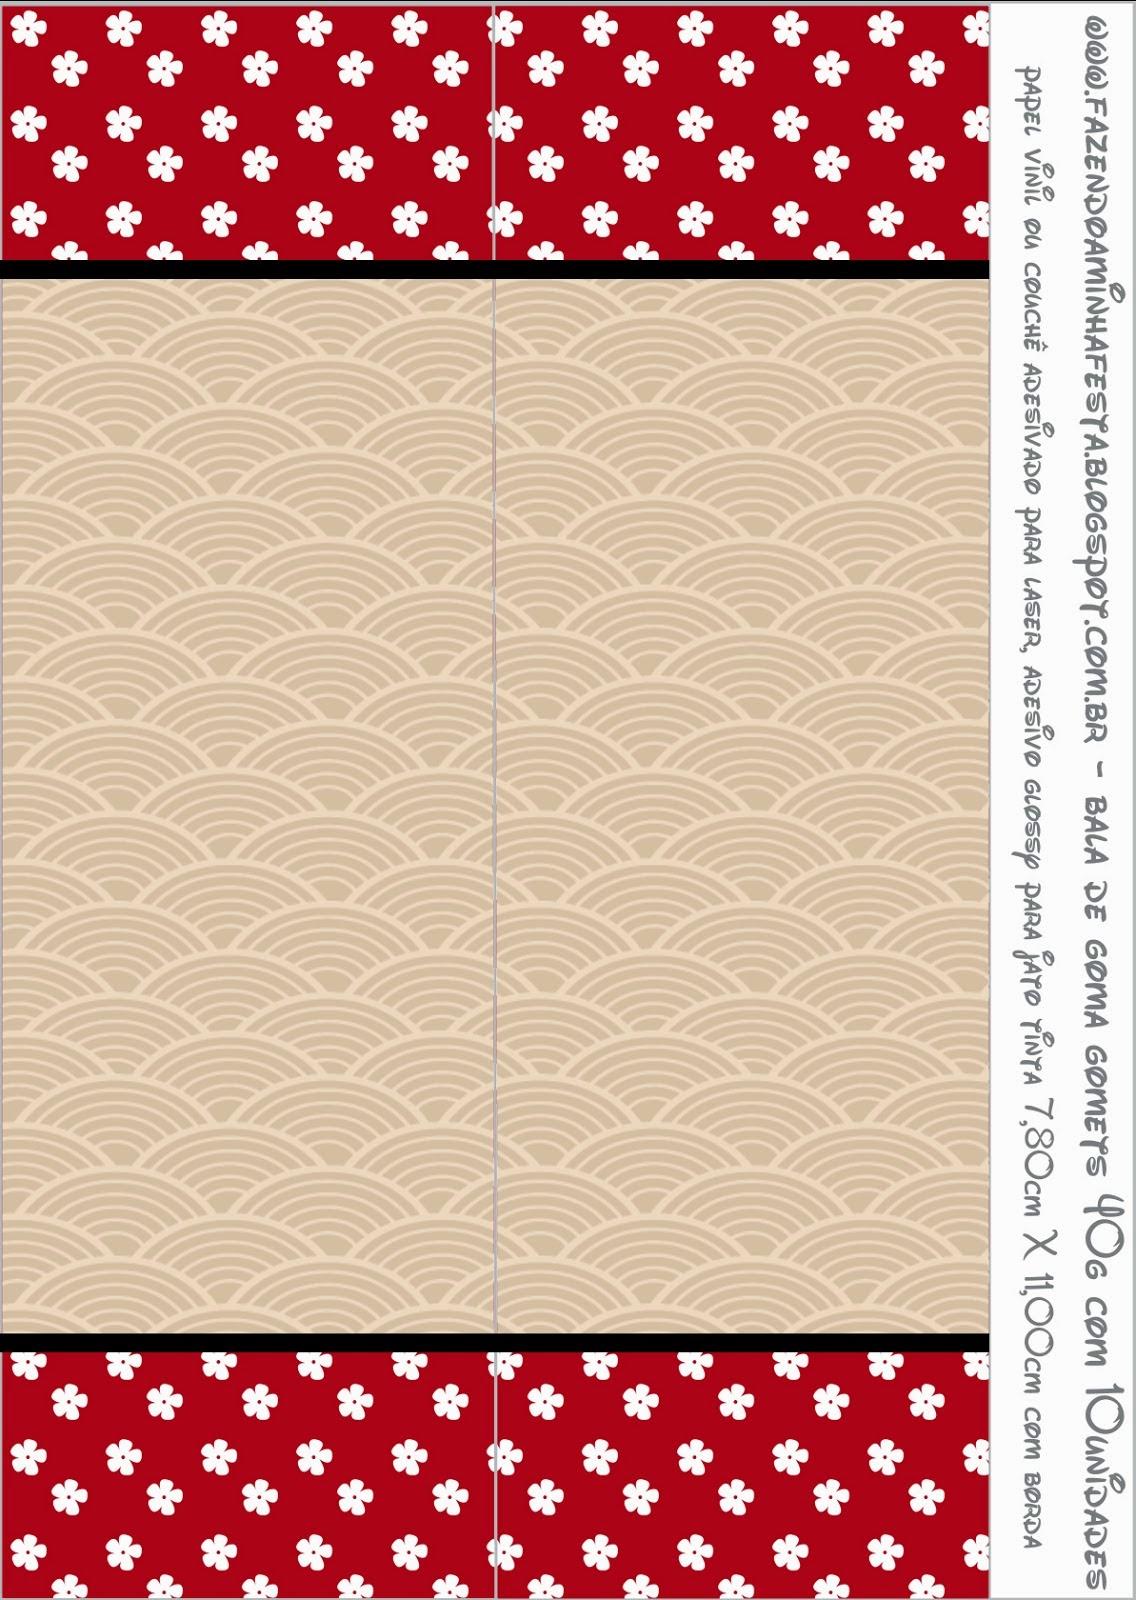 Etiquetas para Imprimir Gratis de Fiesta Estilo Japonés.